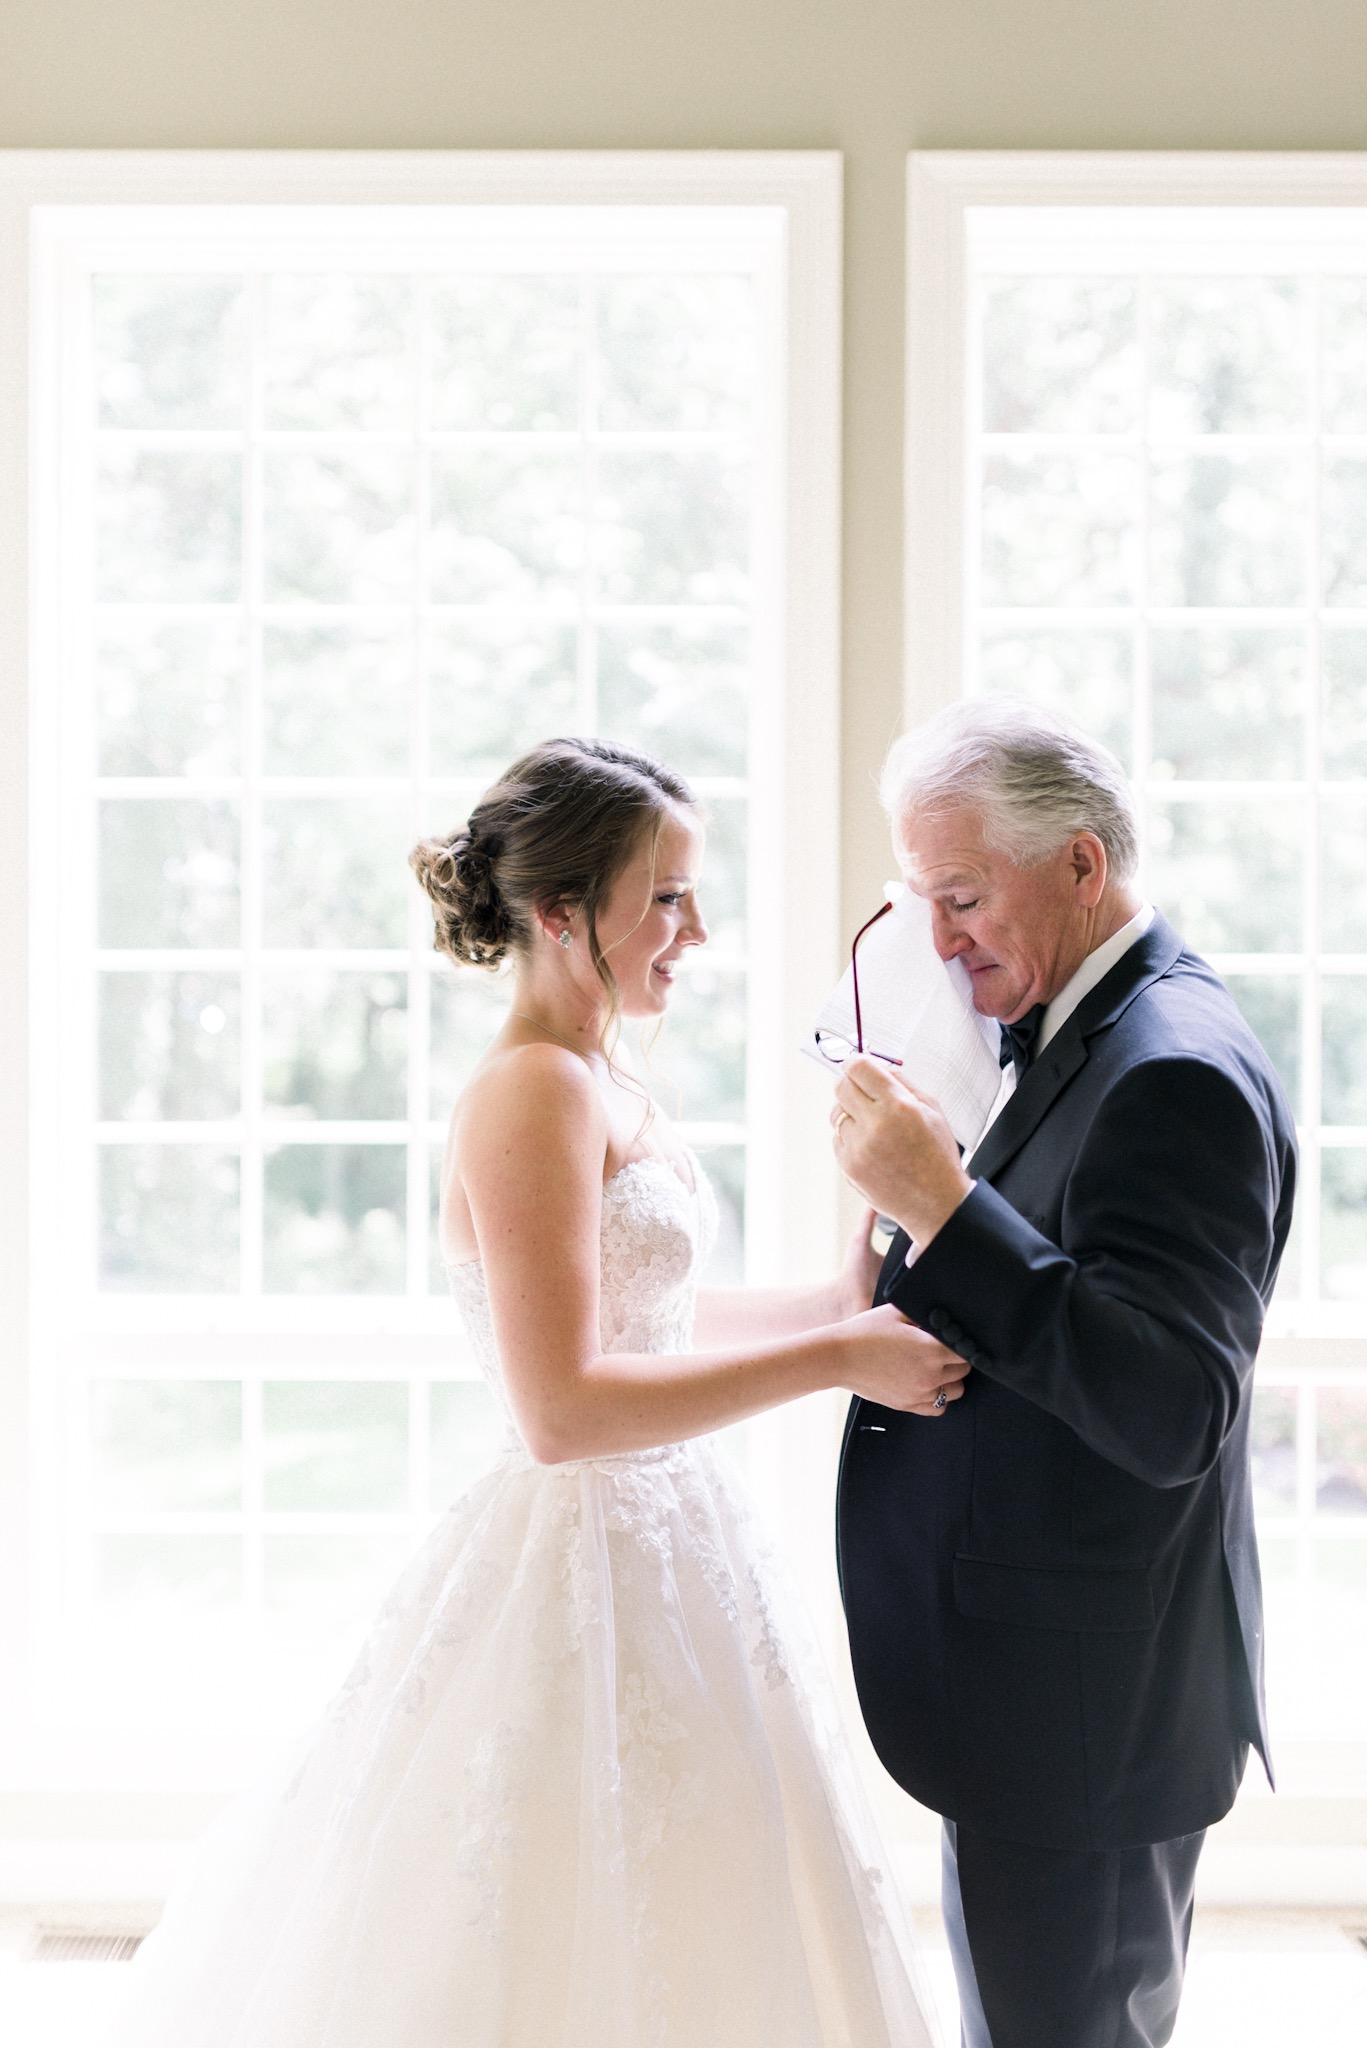 Sarah + Luke   An Elegant Lakeside Wedding in Warsaw   Indianapolis Destination Wedding Photographers